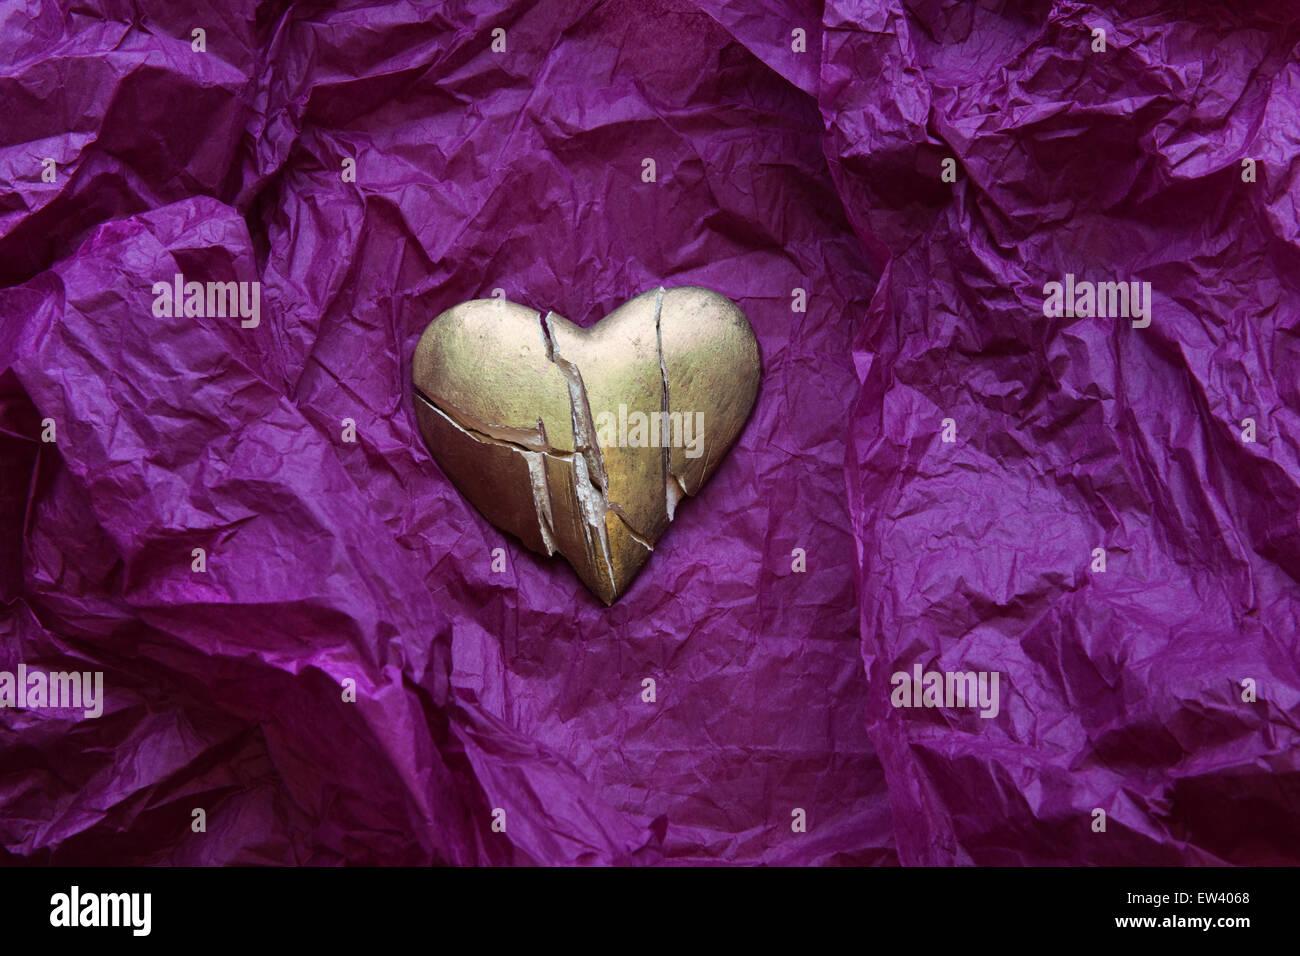 Heartbroken Stockfotos & Heartbroken Bilder - Alamy